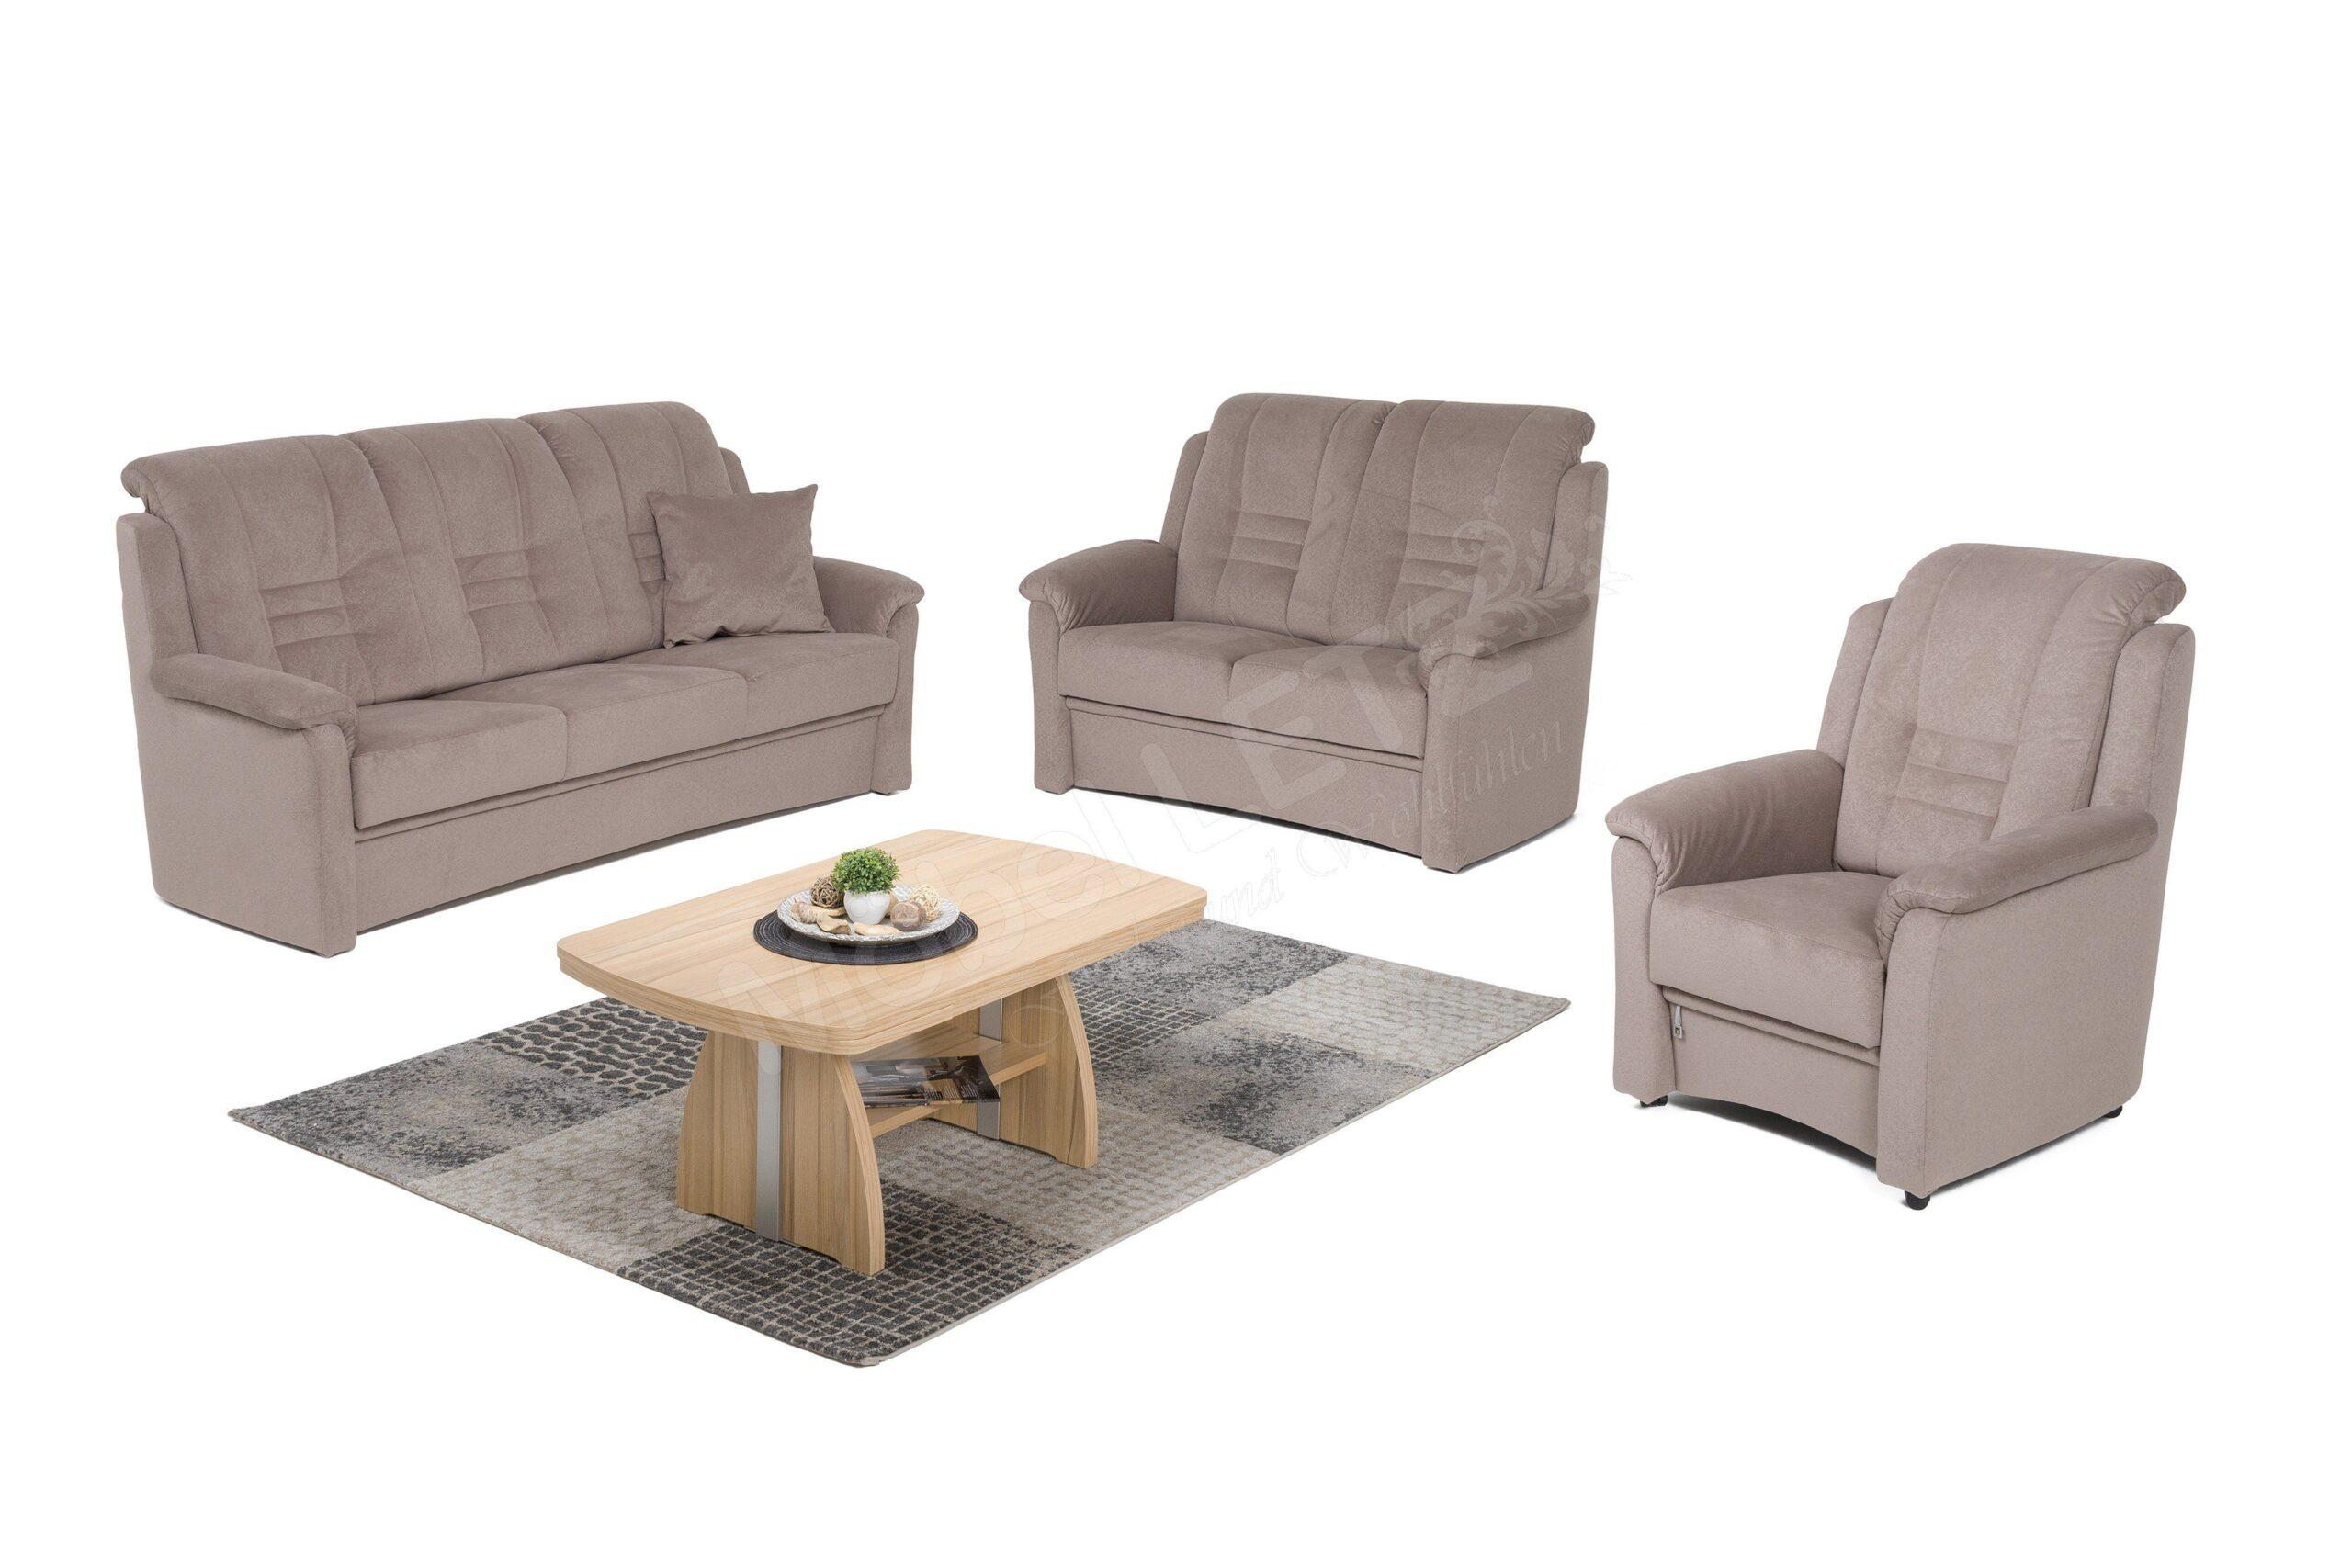 Full Size of Sofa Garnitur Moderne Garnituren 3 Teilig Leder Echtleder 2 3 2 1 Gebraucht 3 2 Couch Ikea Rundecke Kasper Wohndesign Poco Sofa Garnitur 3/2/1 Eiche Massivholz Sofa Sofa Garnitur